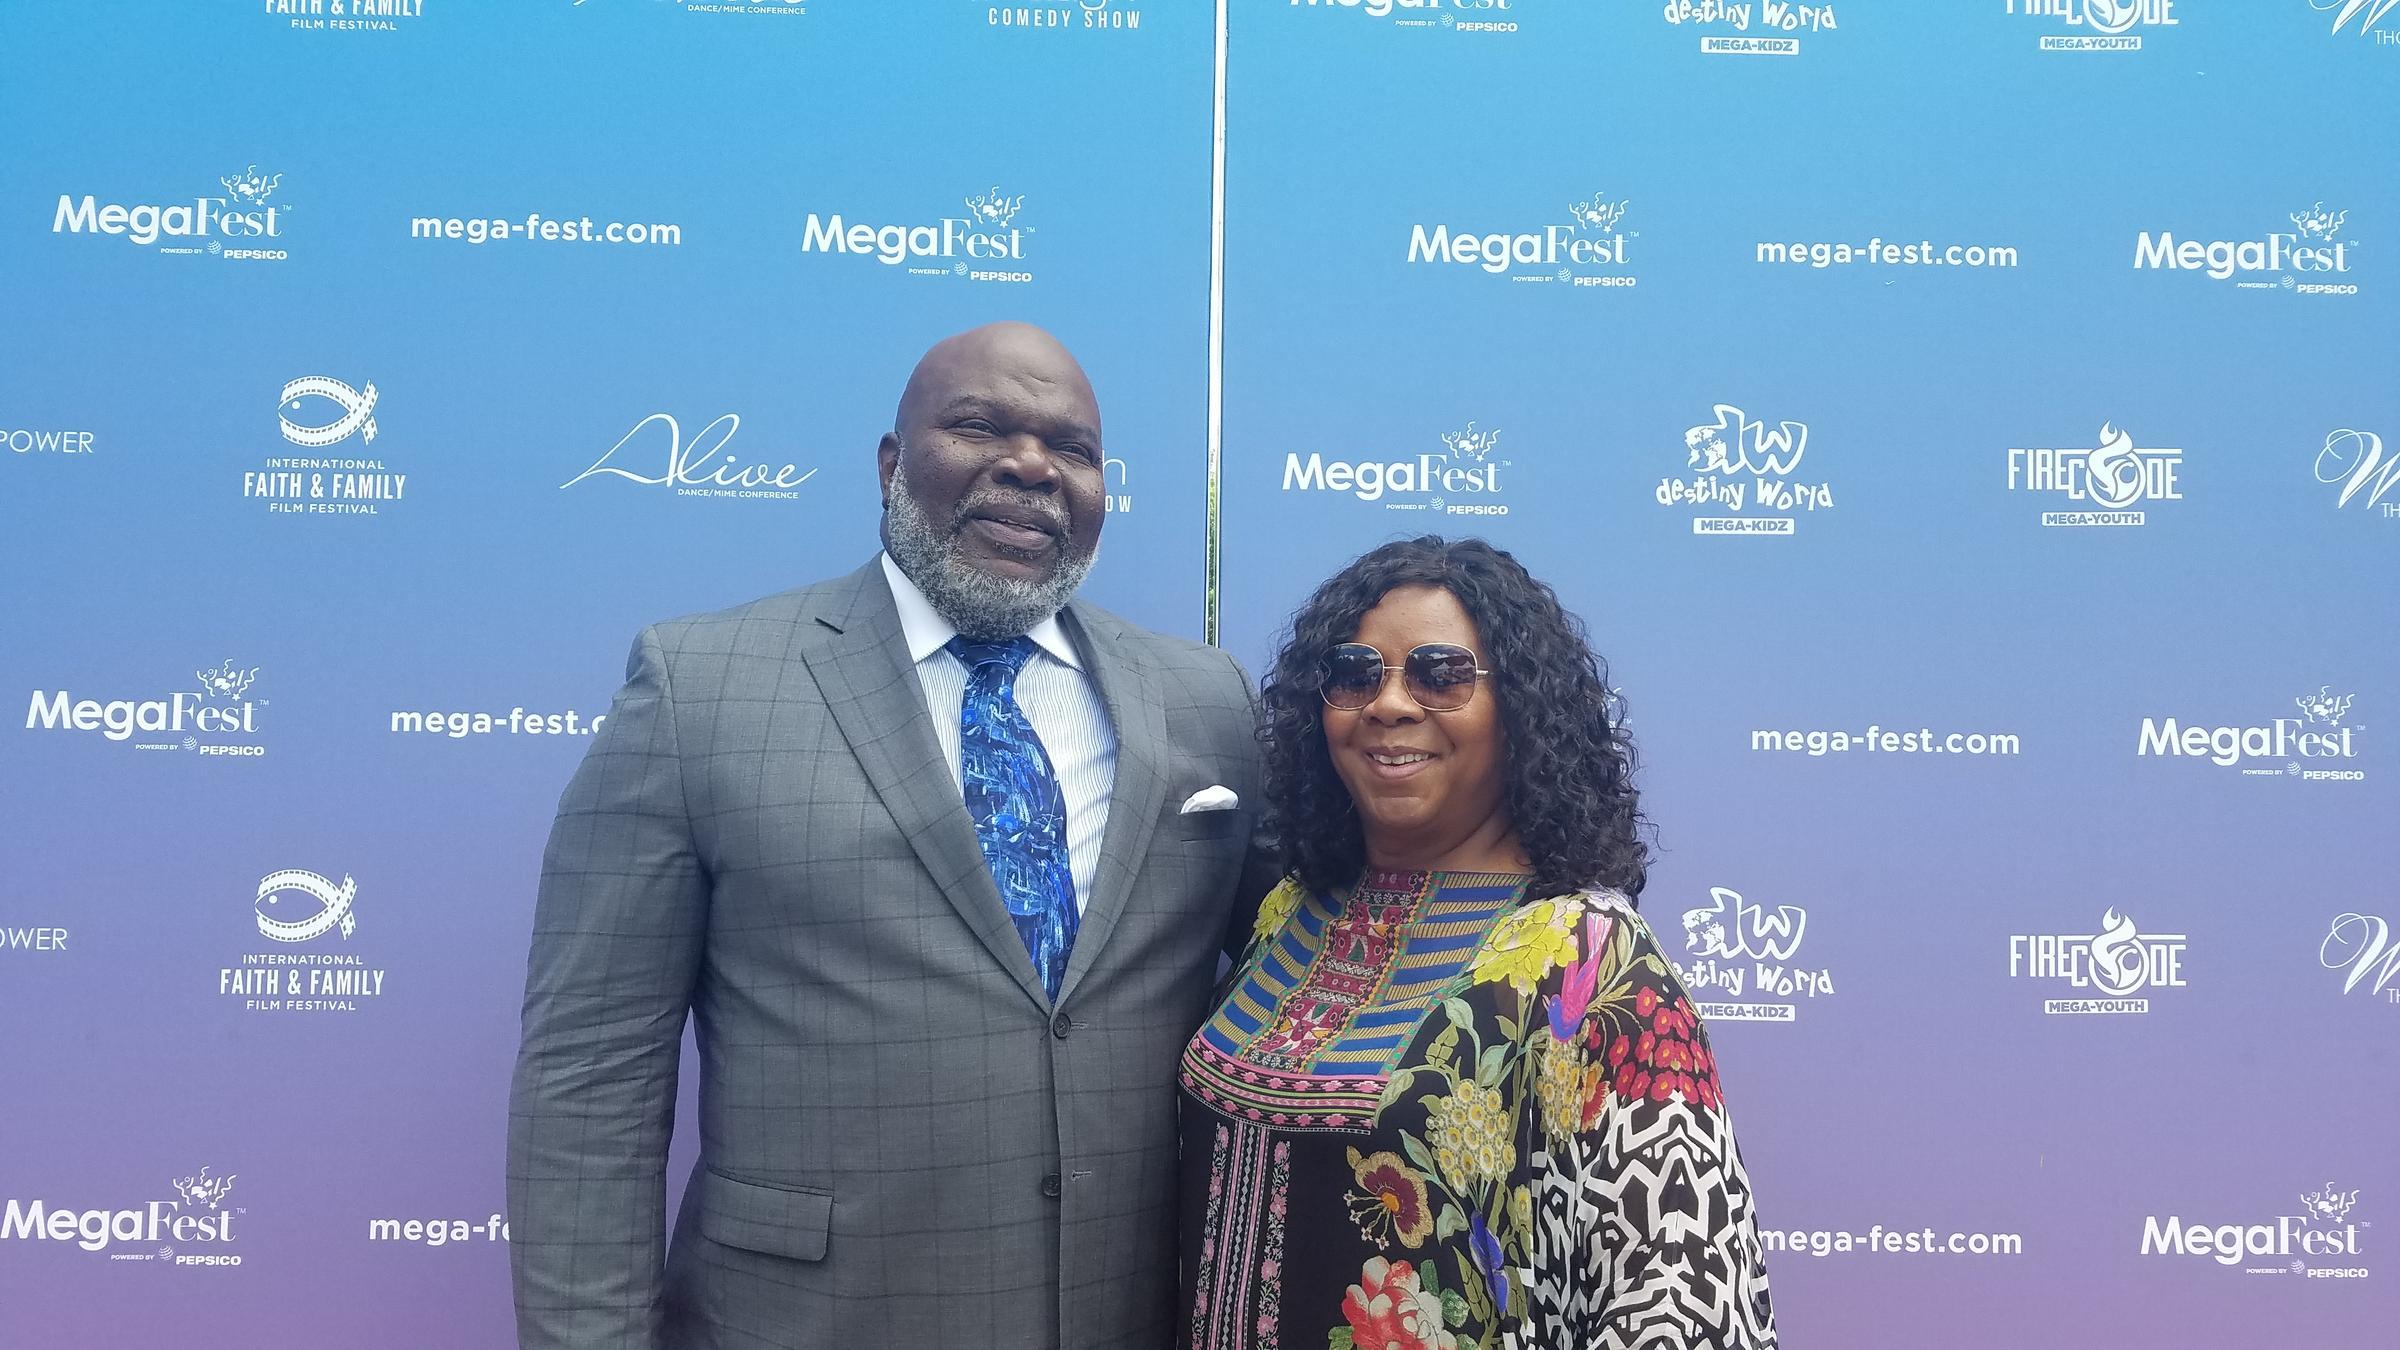 MegaFest, A Giant Faith And Family Festival, Promises To